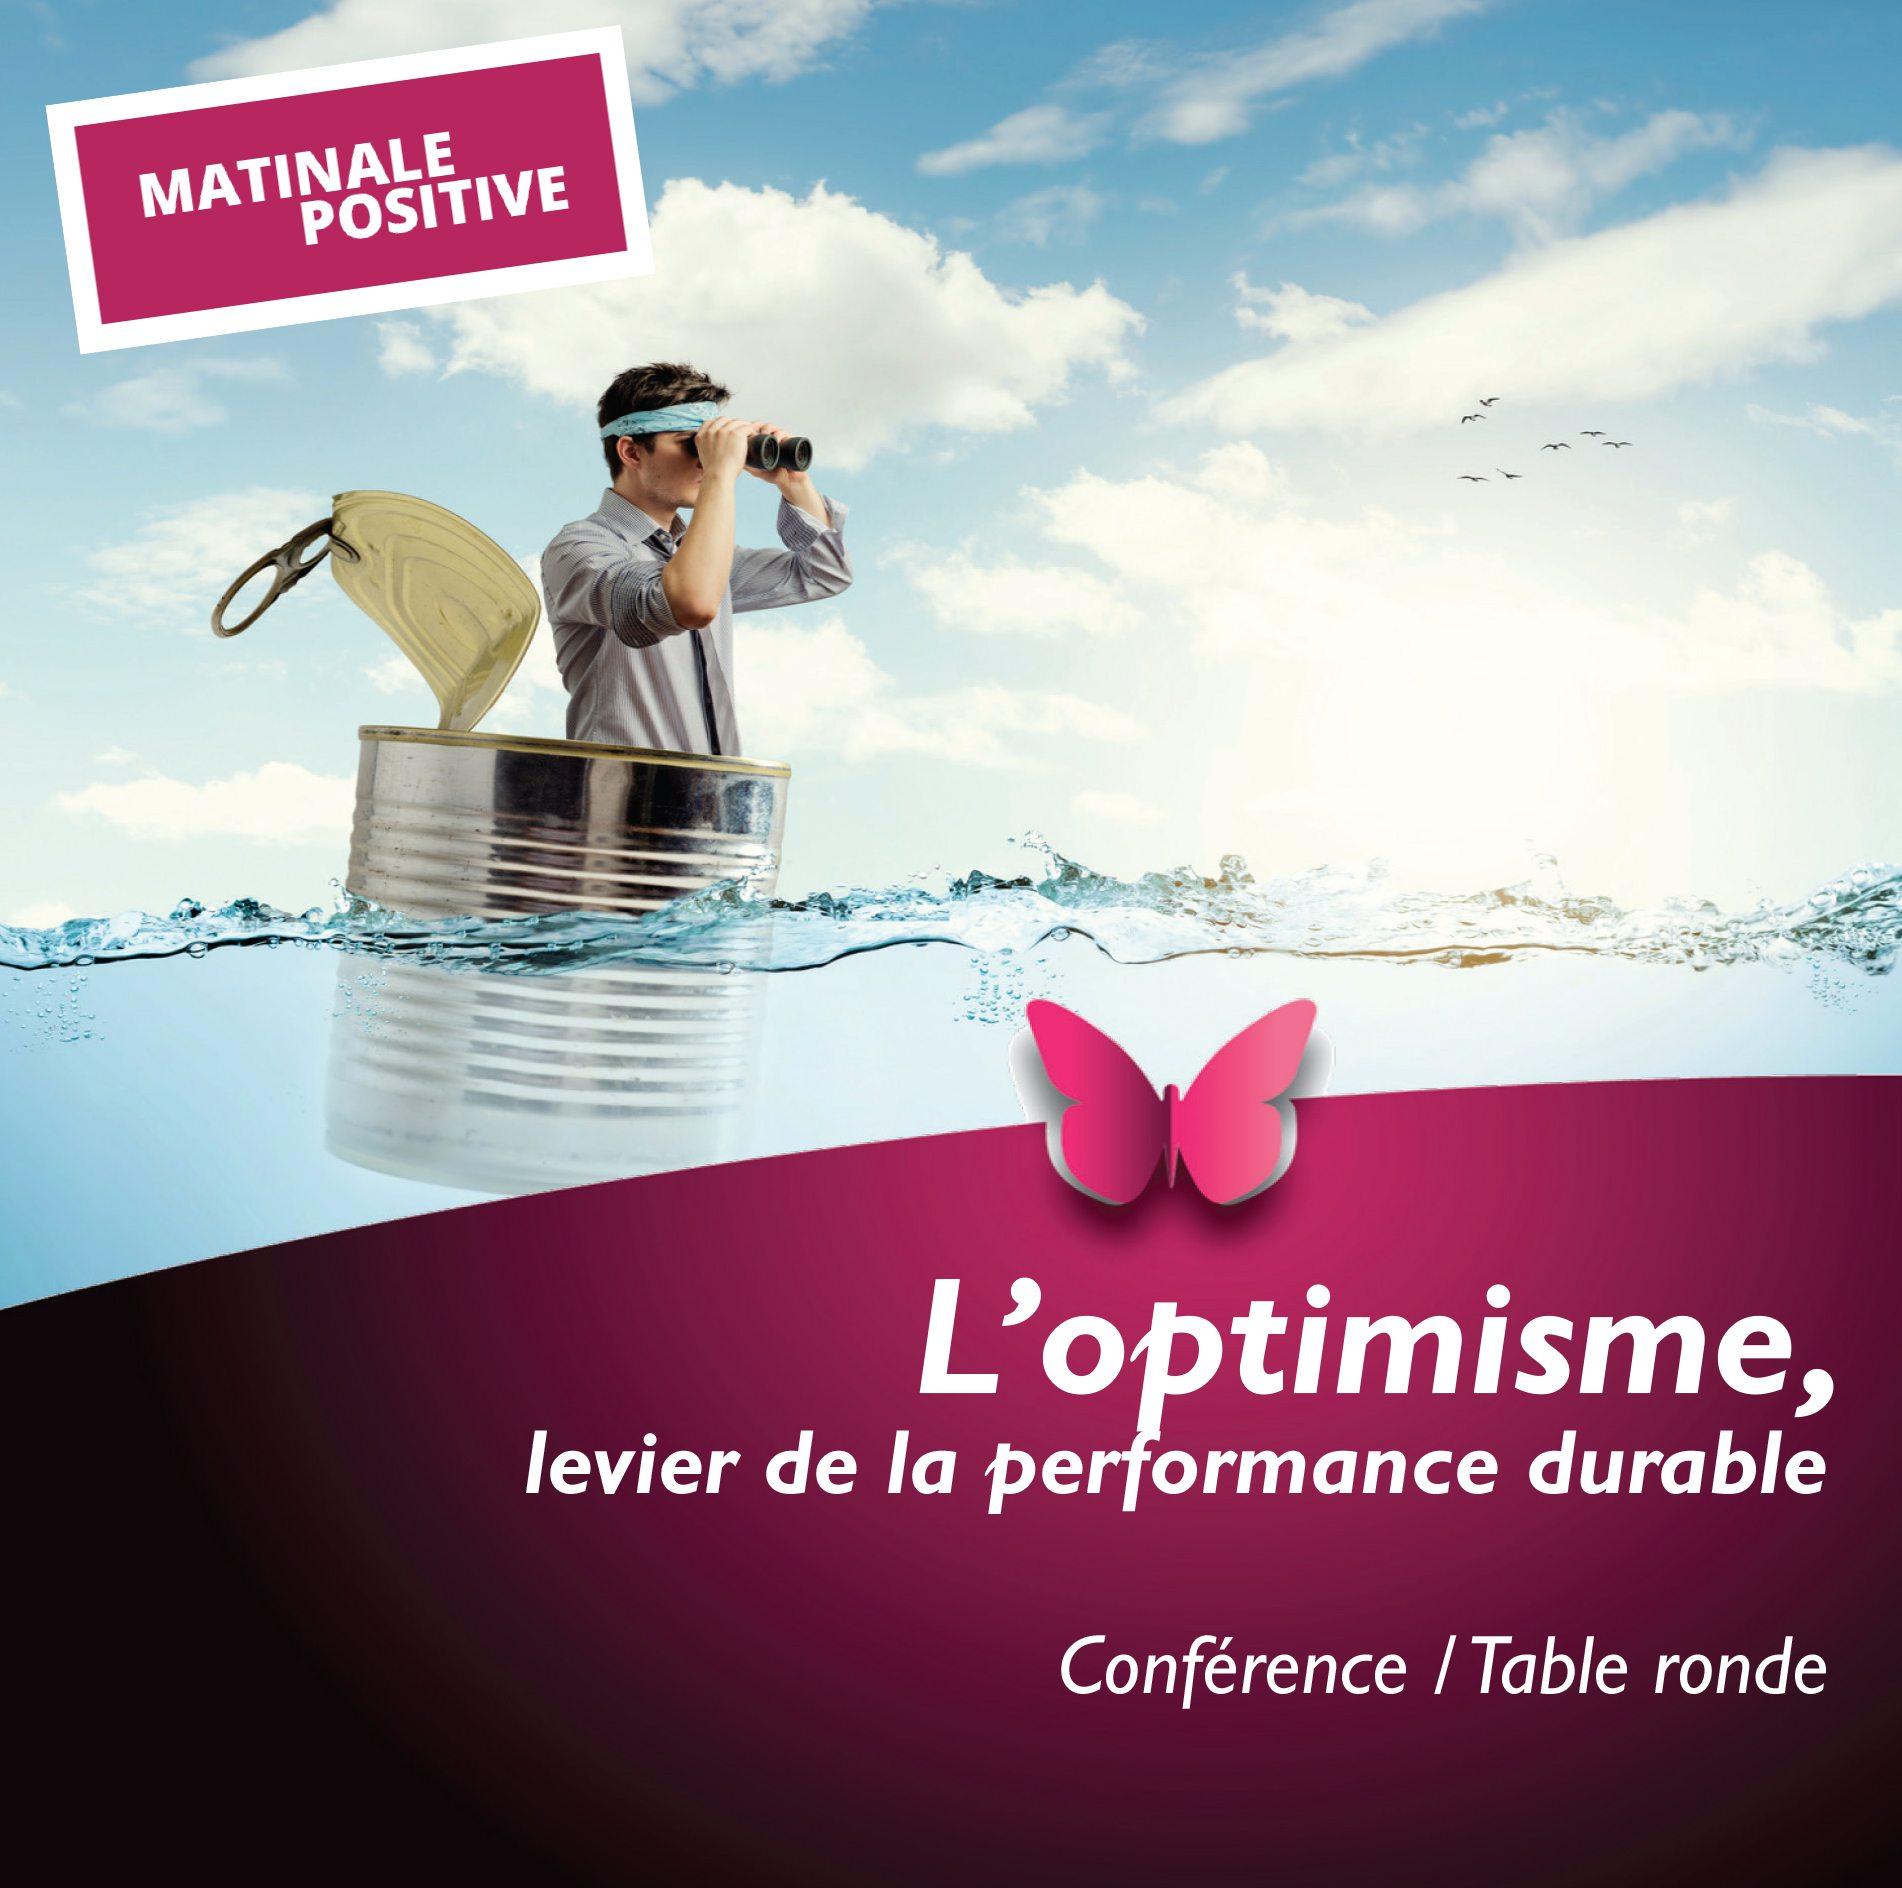 2016 01 19 Invitation conférence Optimisme VIP dd-1